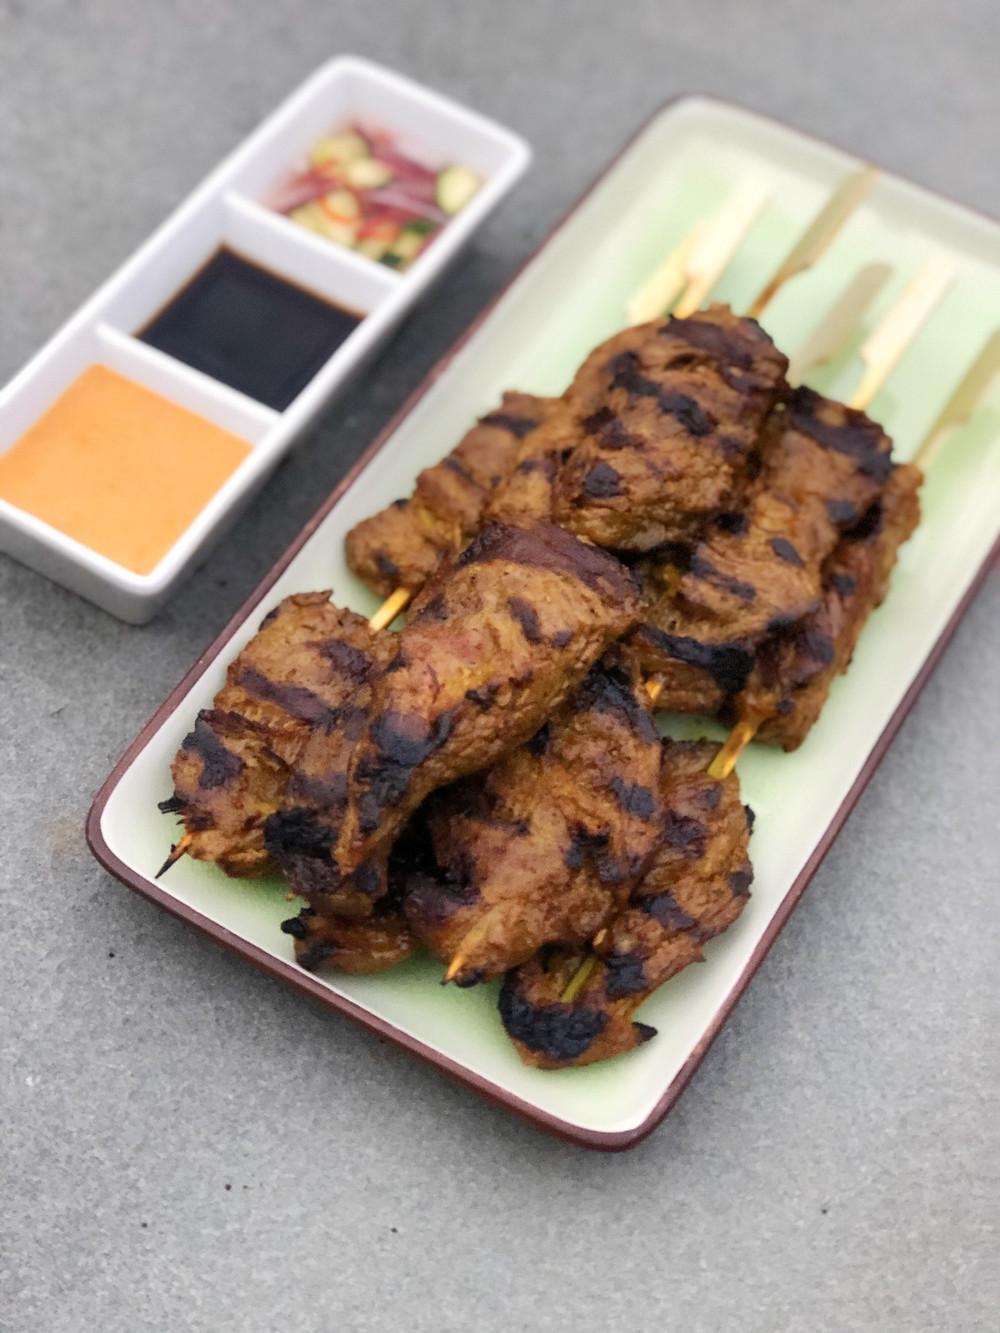 Beef Satay Skewers with Peanut Sauce